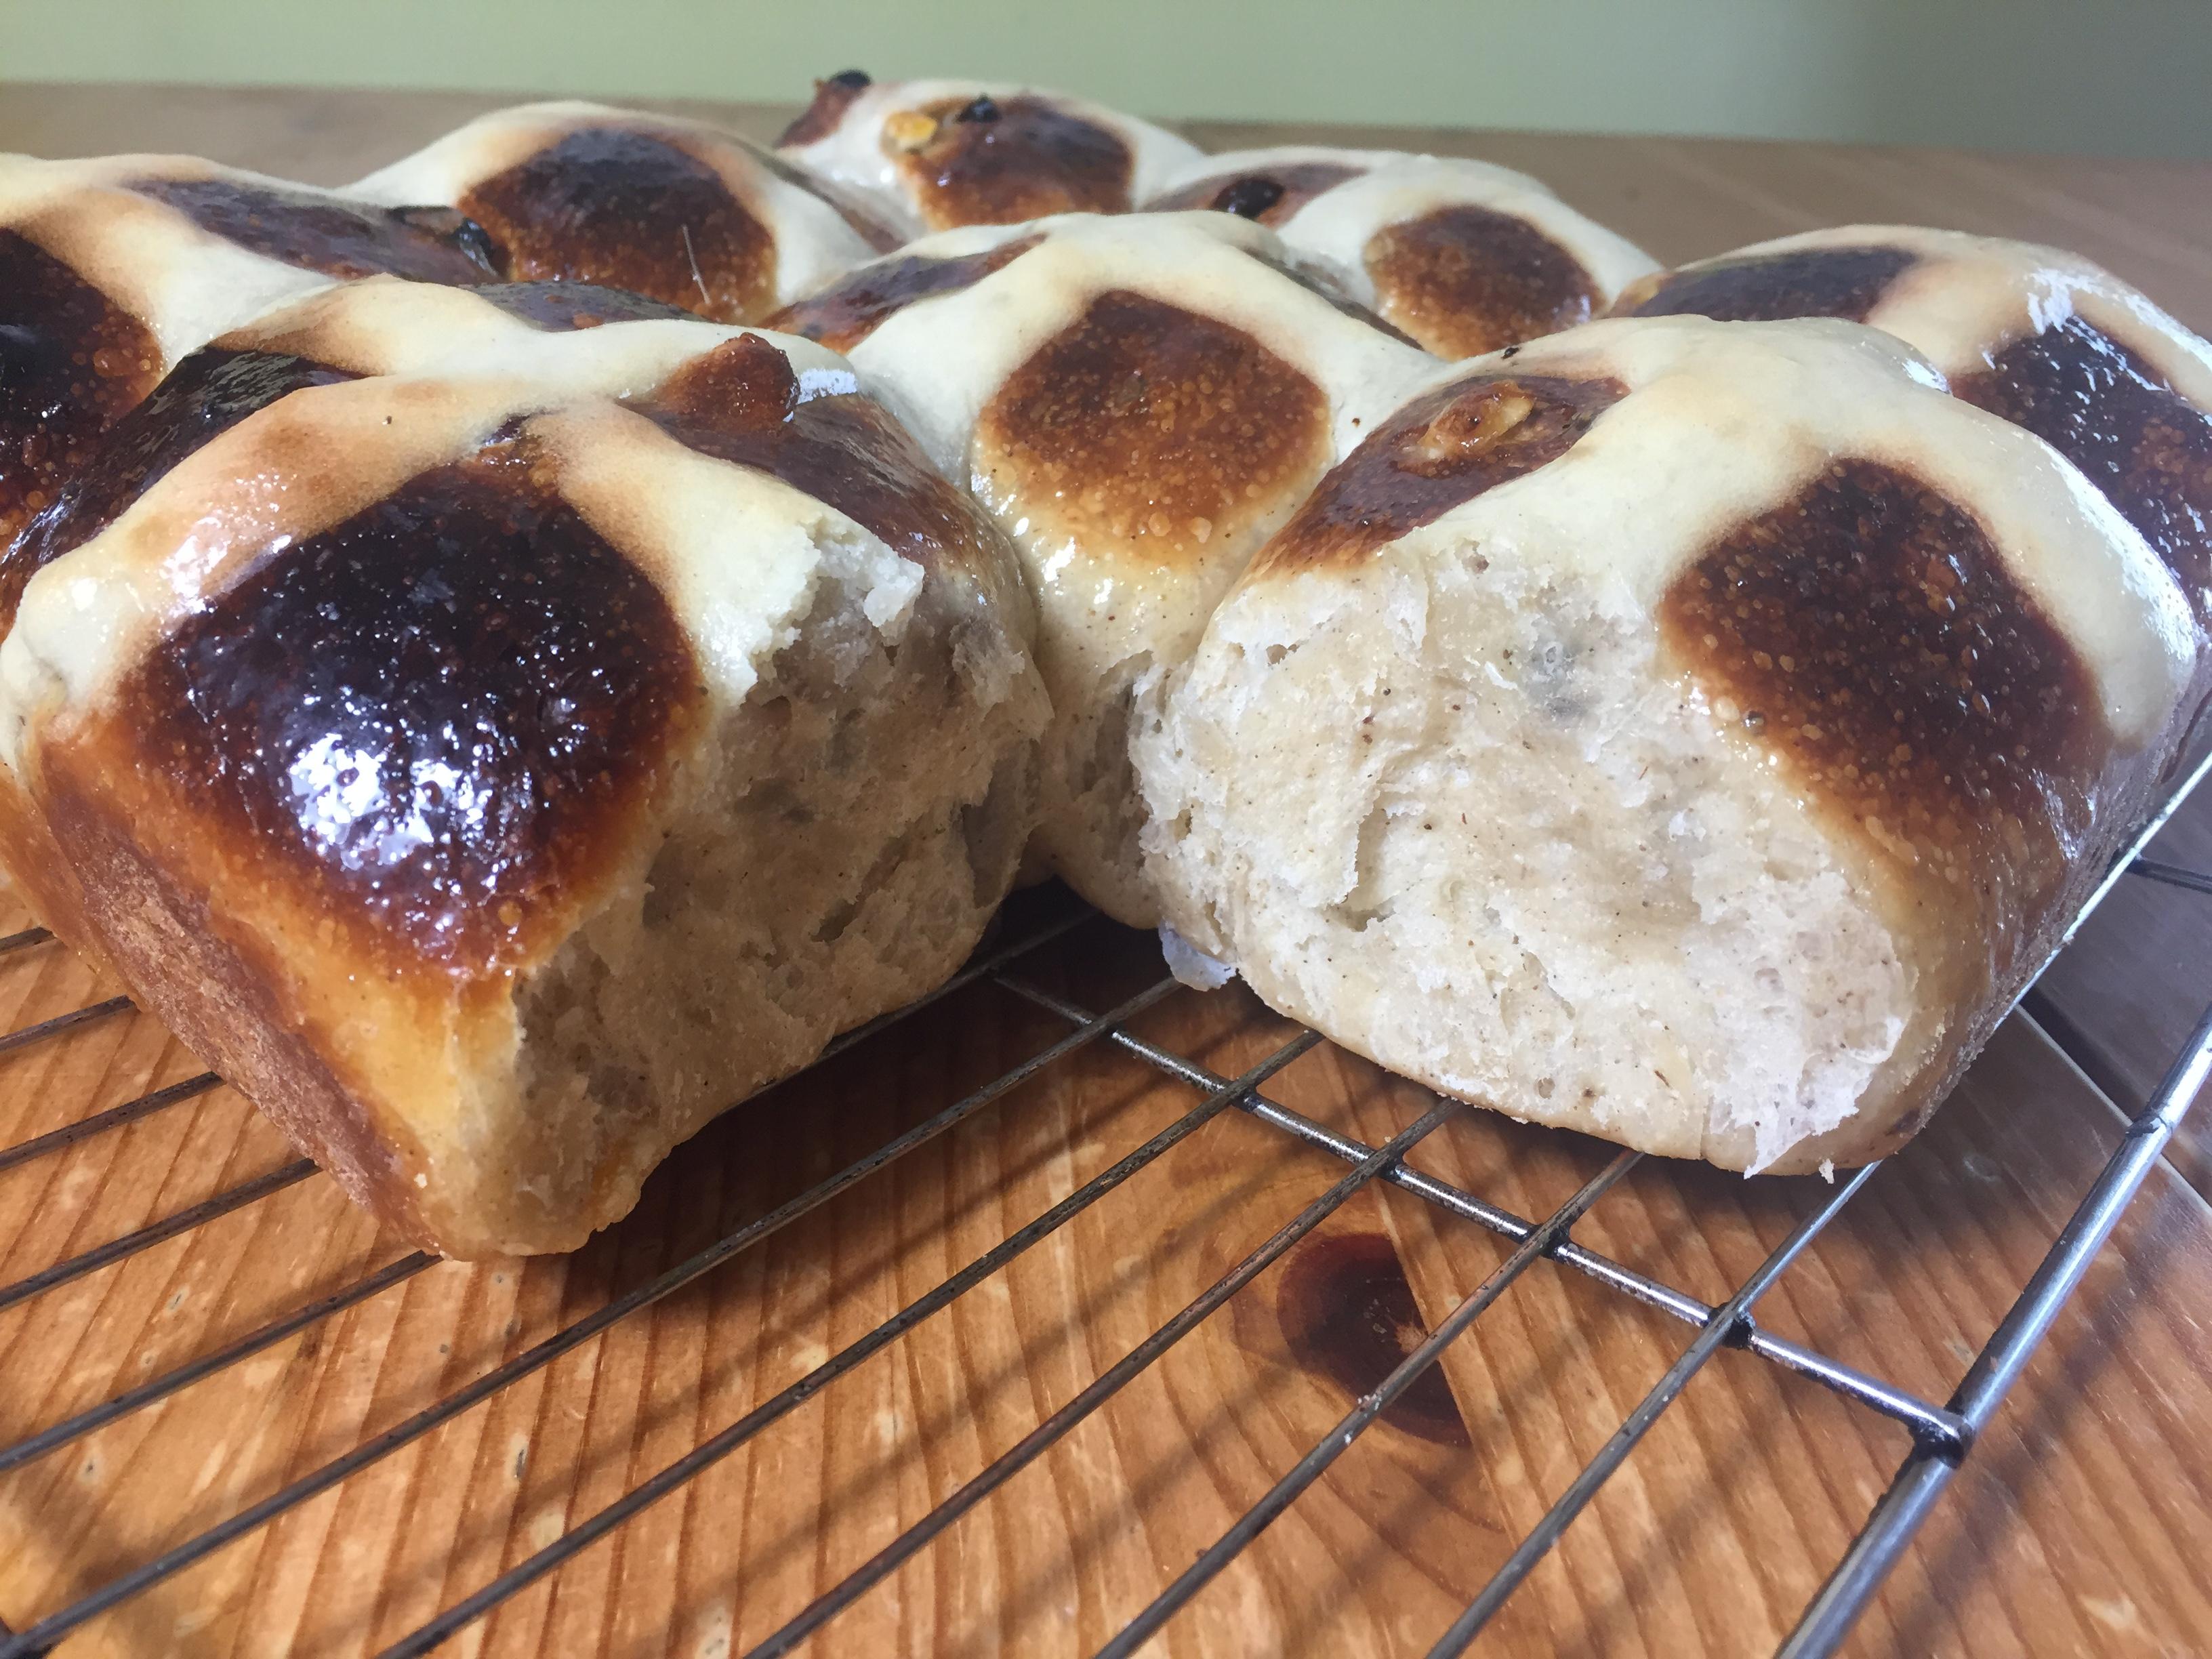 Homemade hot cross buns recipe